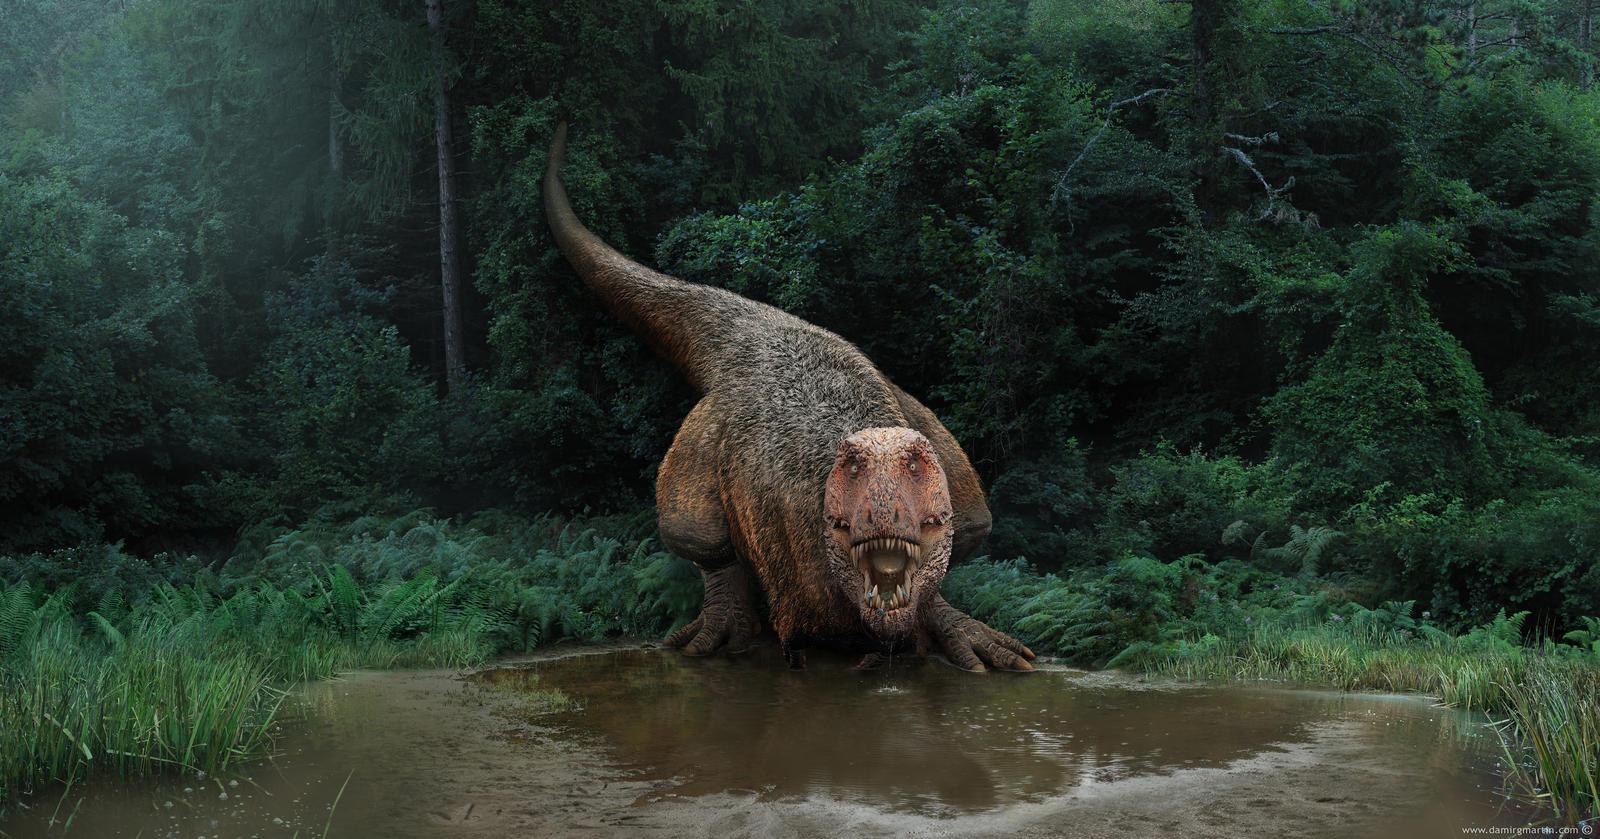 tyrannosaurus_on_a_watering_hole_by_damir_g_martin-dane4wn.jpg